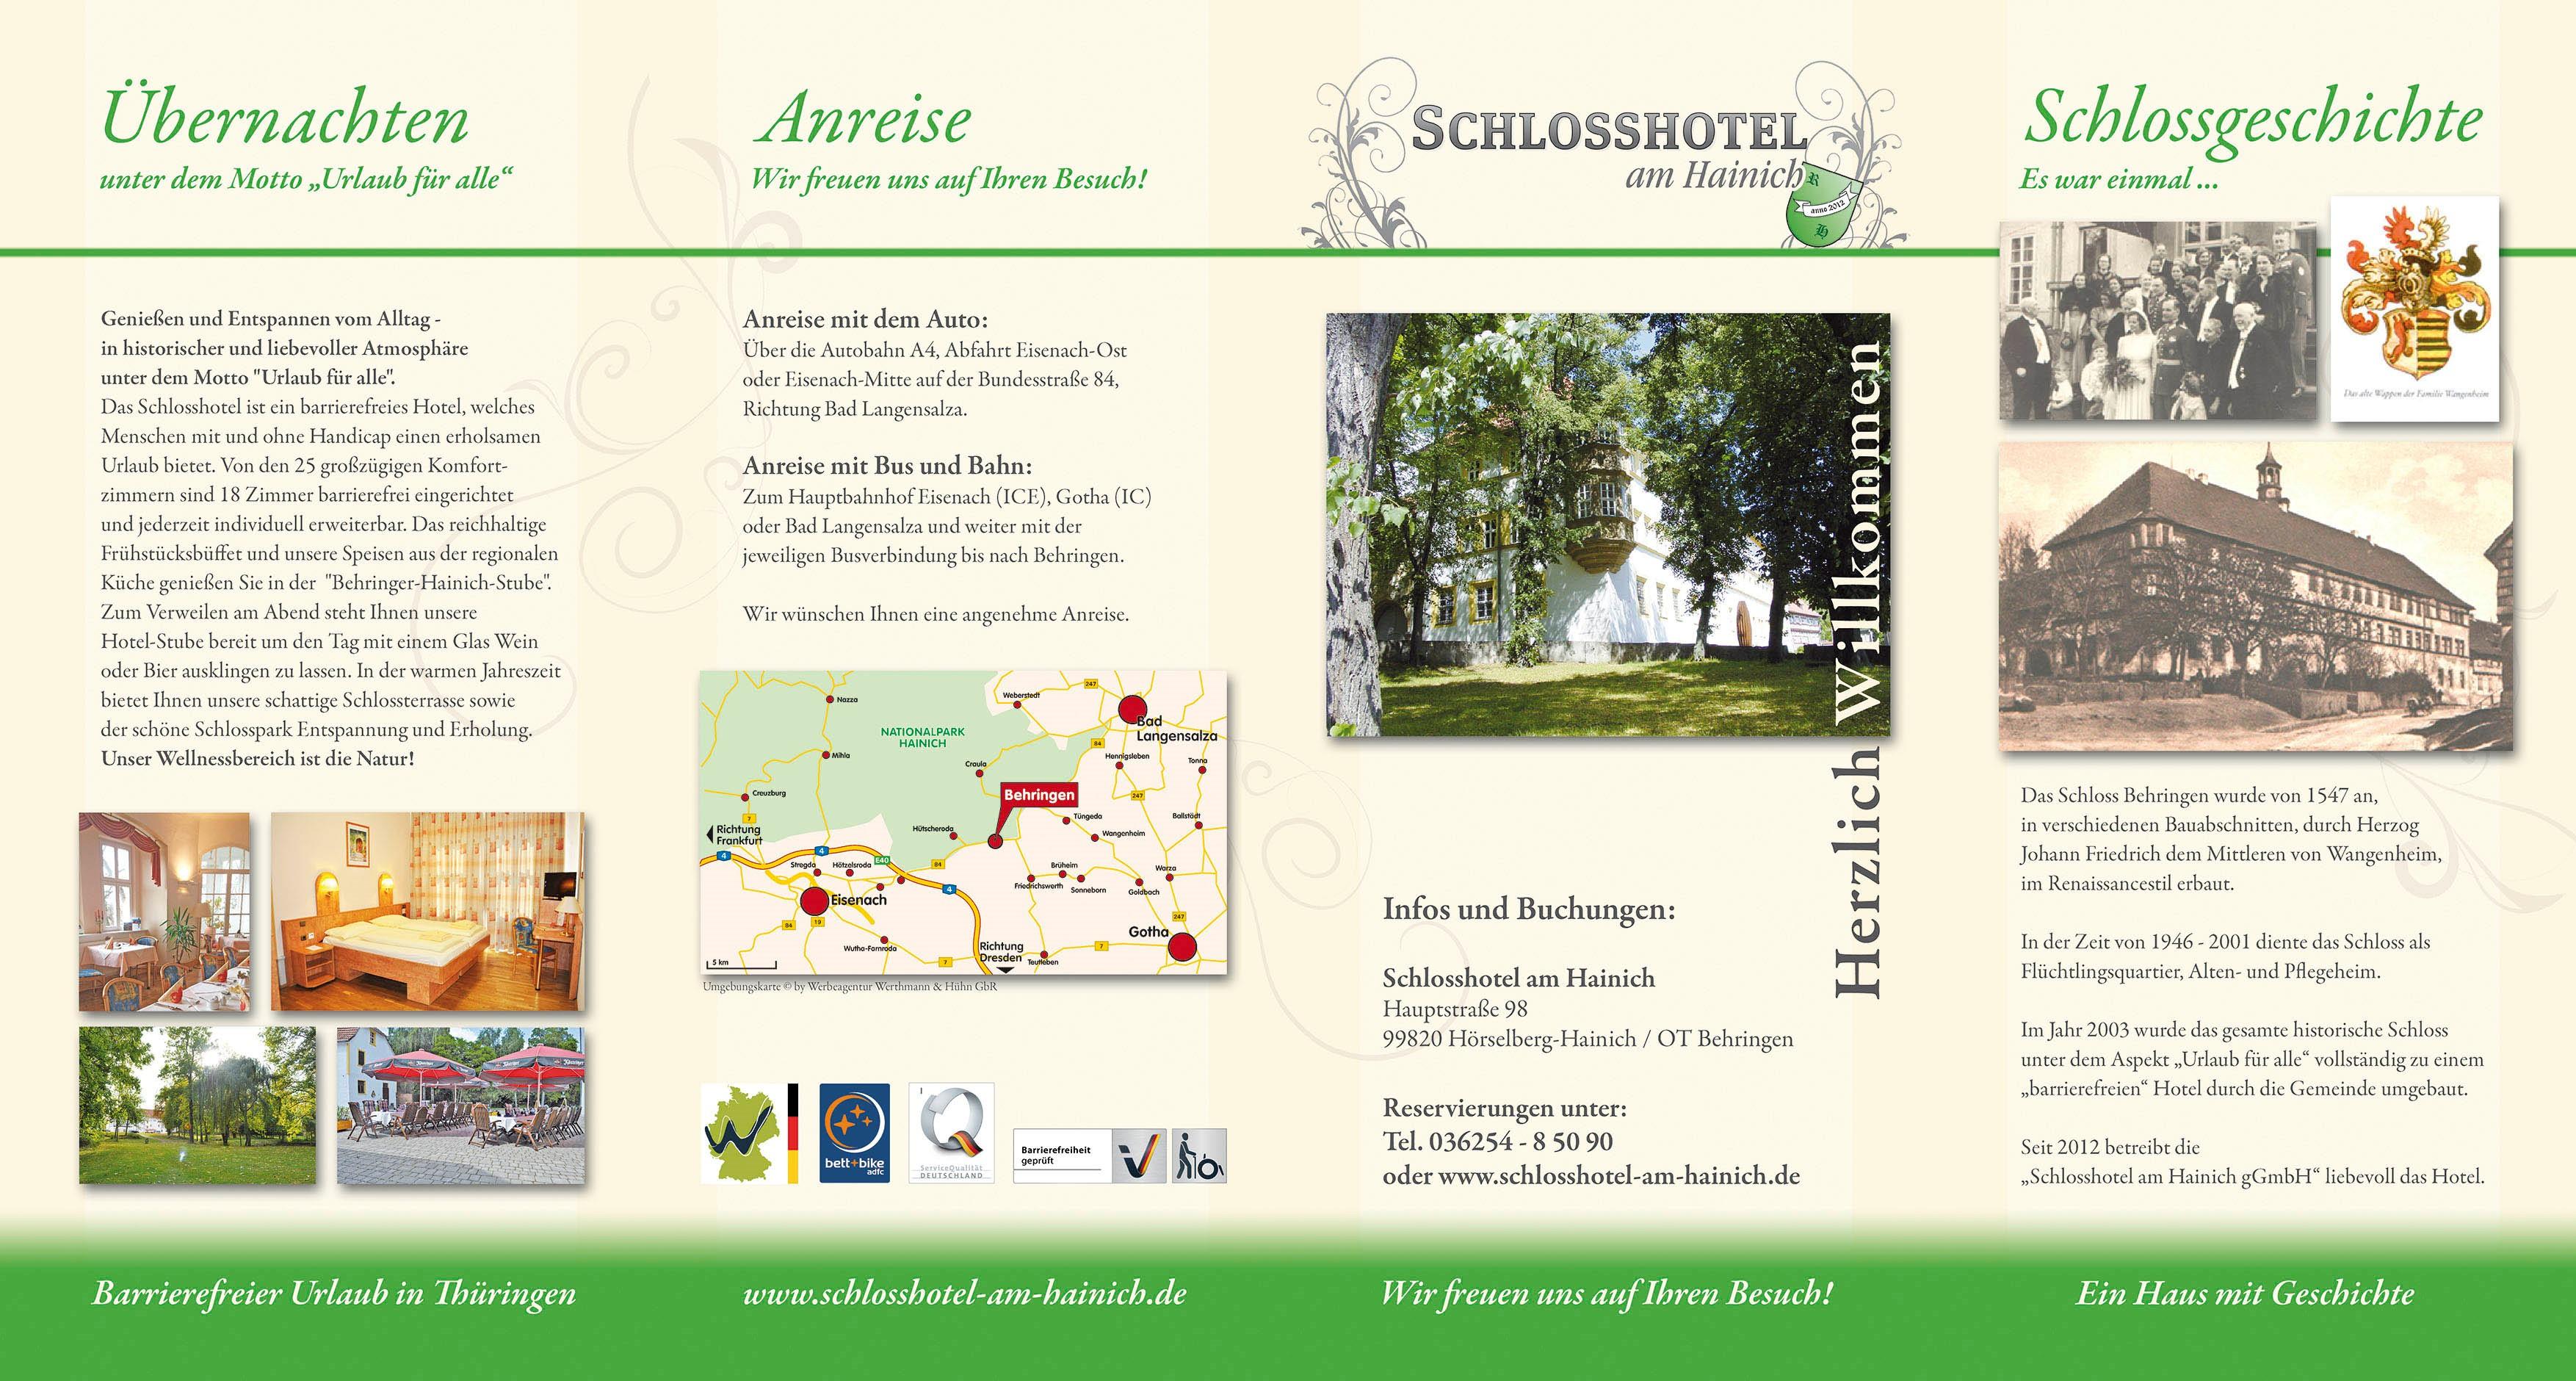 99820 Hörselberg Hainich Ot Behringen home